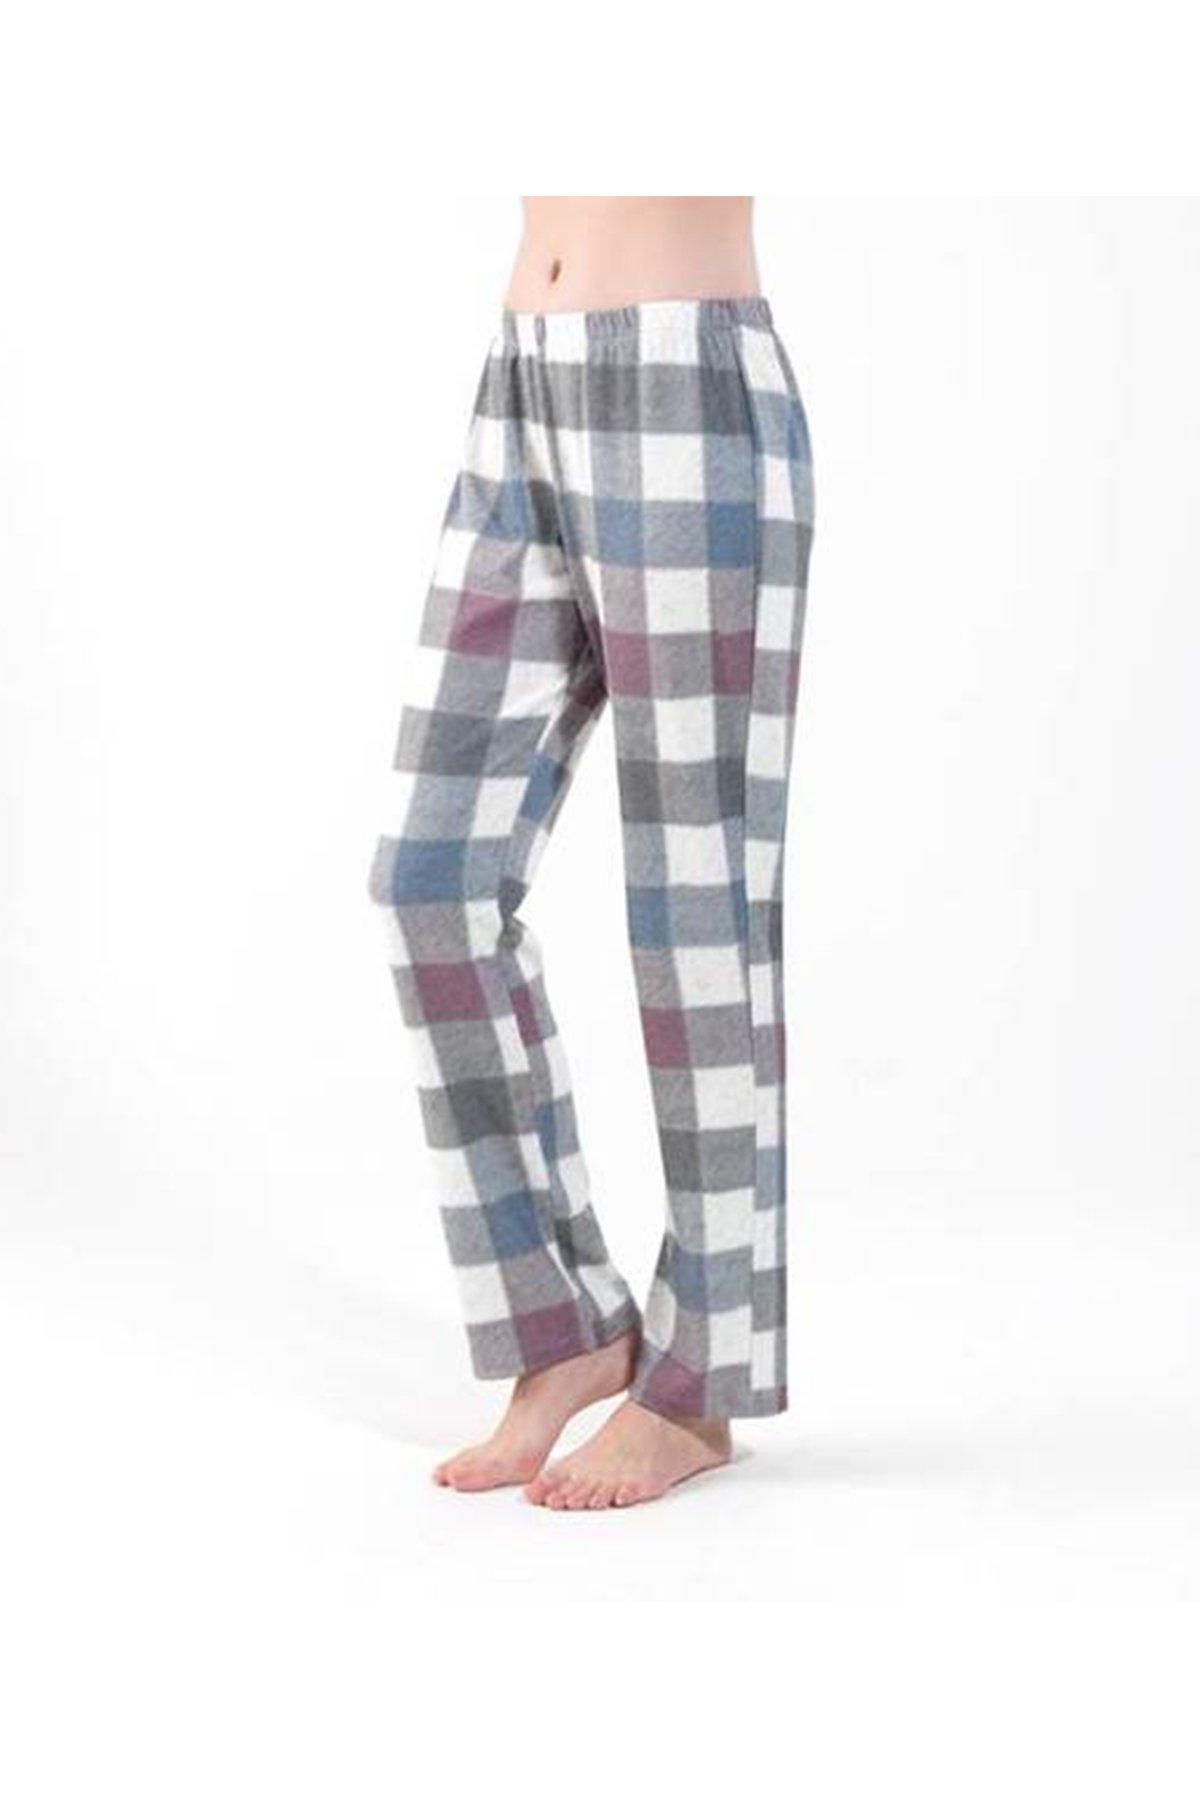 https://resim.ikisepet.com/18k027018b0002/ekose/6601-narkon-kadin-pijama-alt-55158-7004.jpg